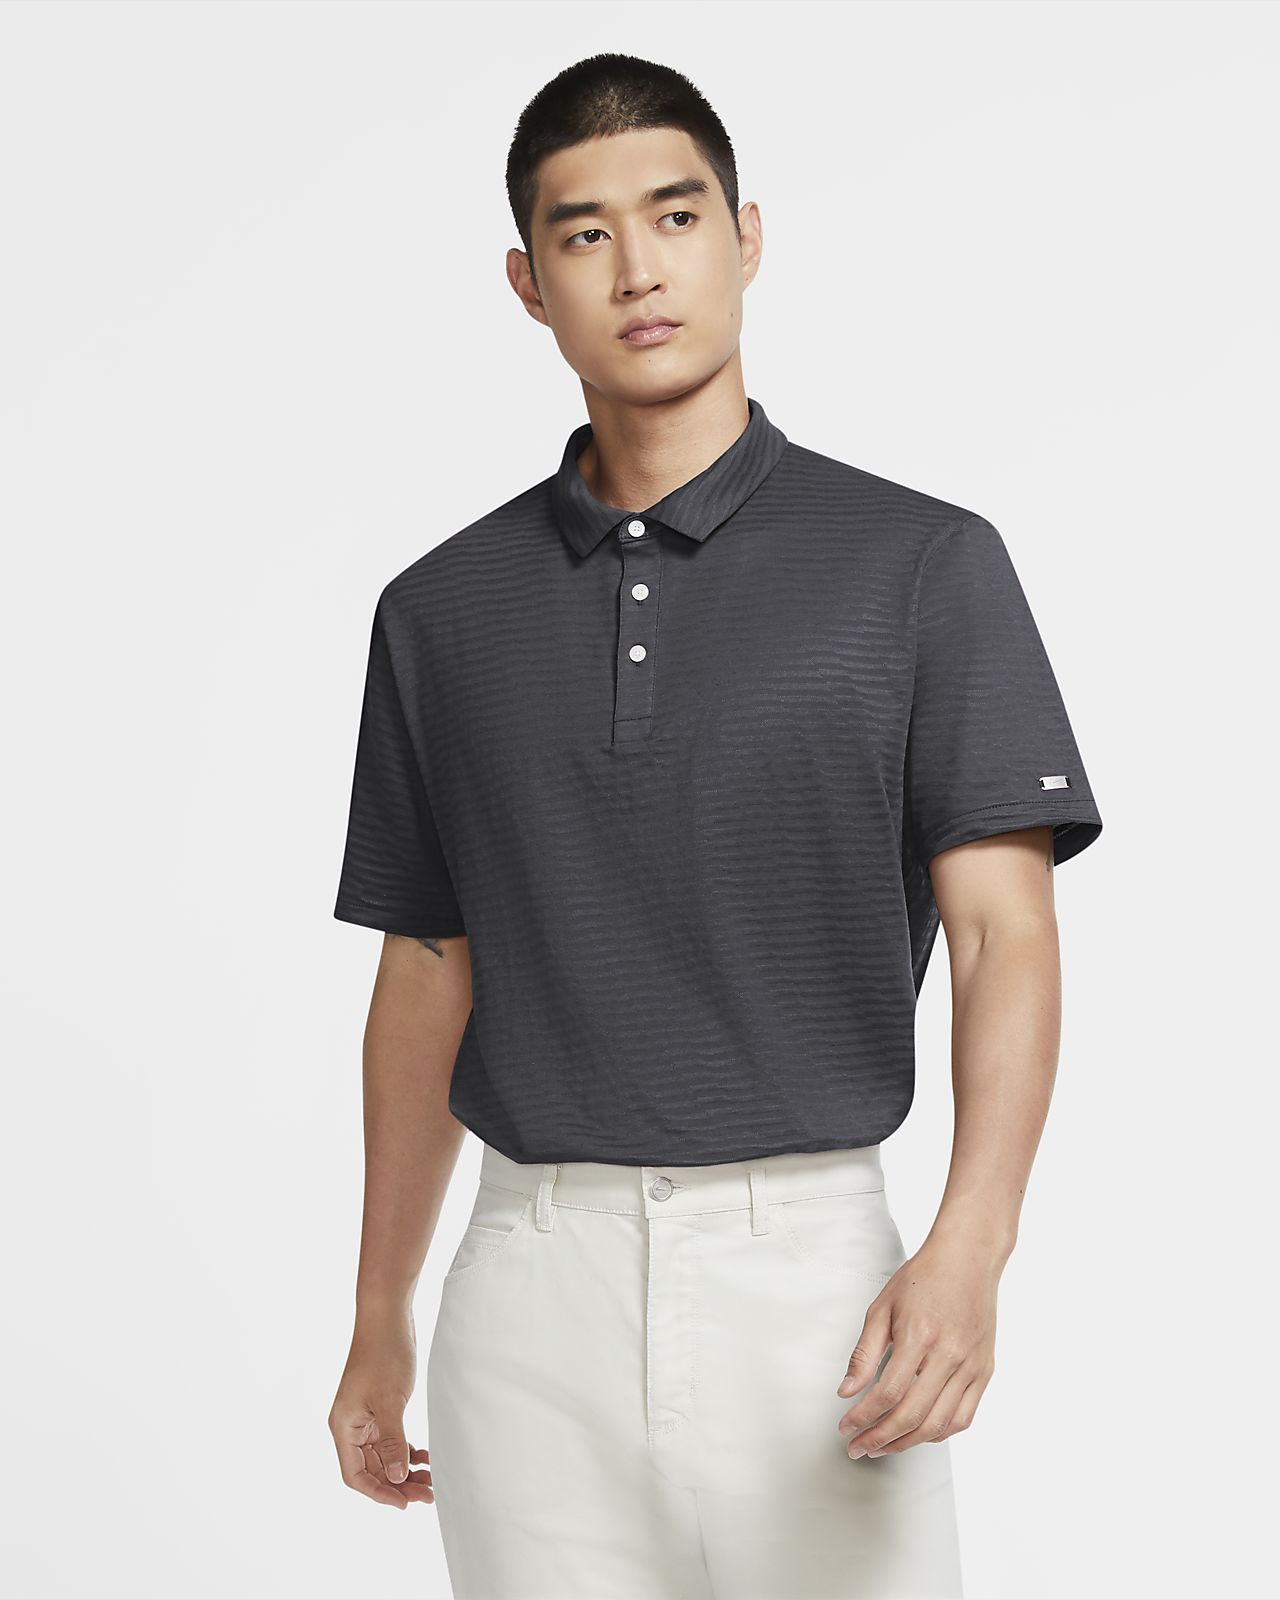 Nike Dri-FIT Player 男款高爾夫球衫